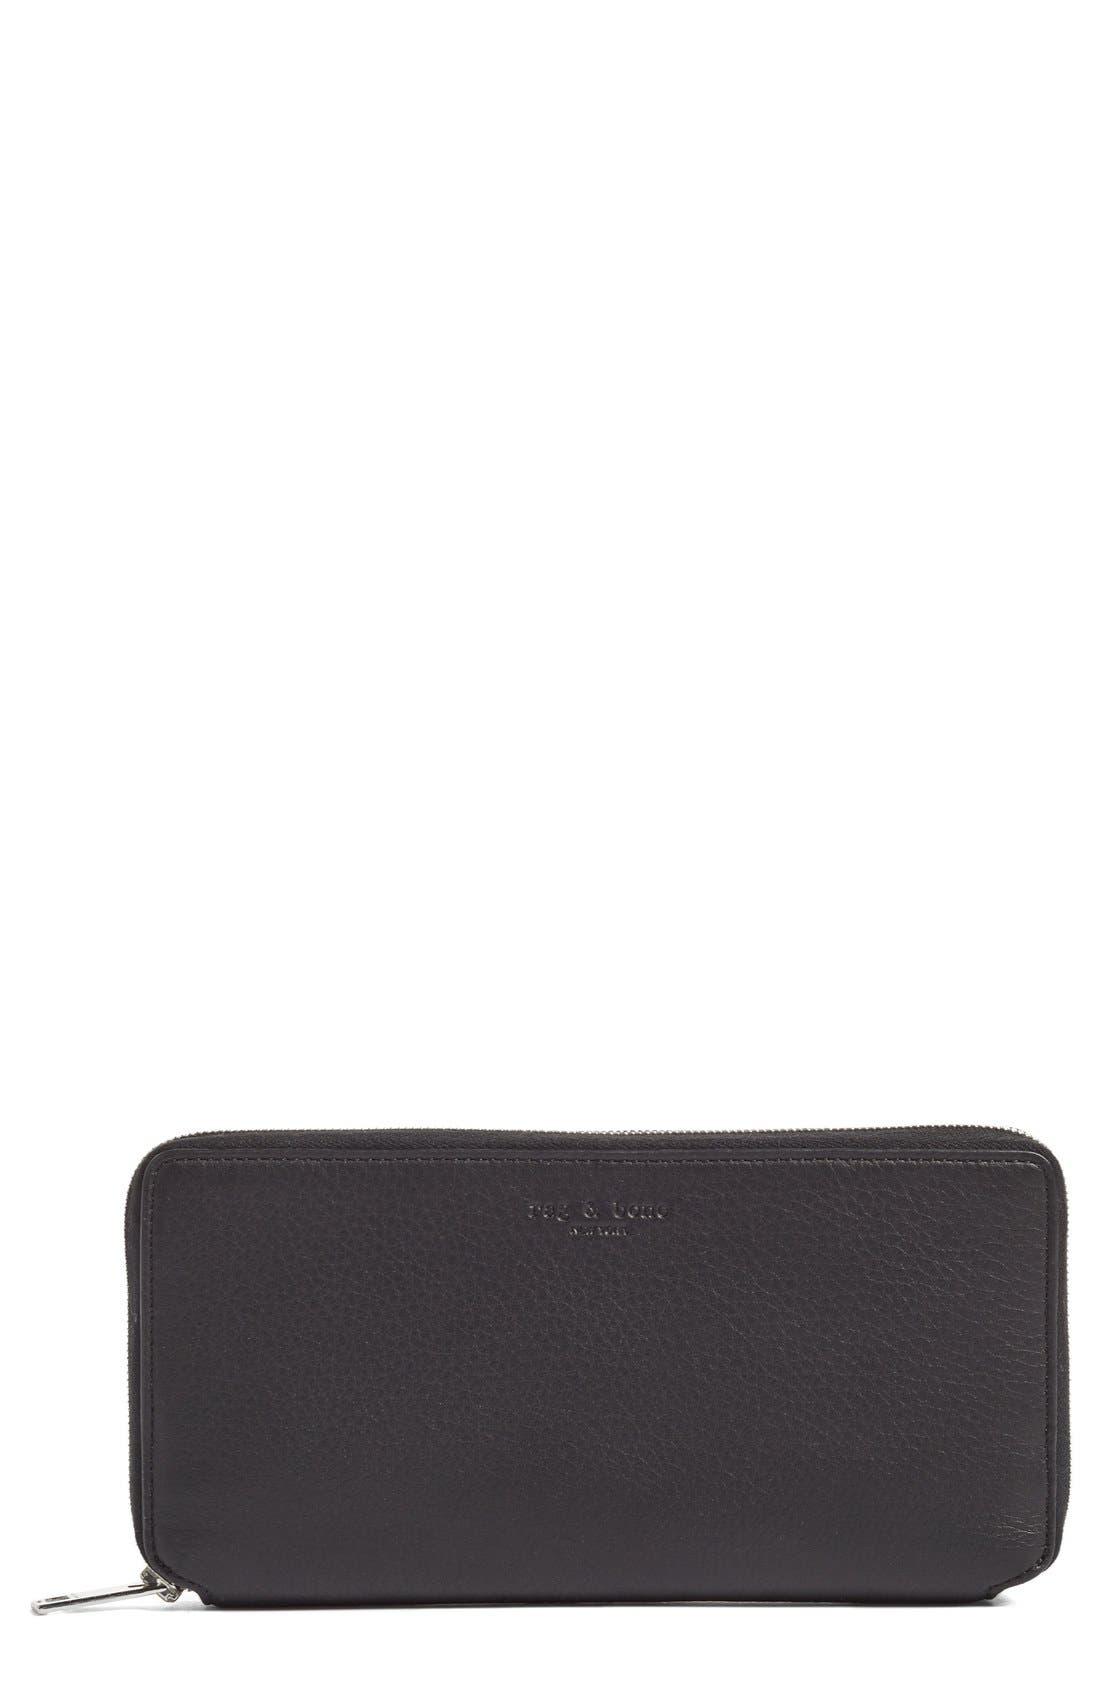 Main Image - rag & bone Leather Zip Around Wallet